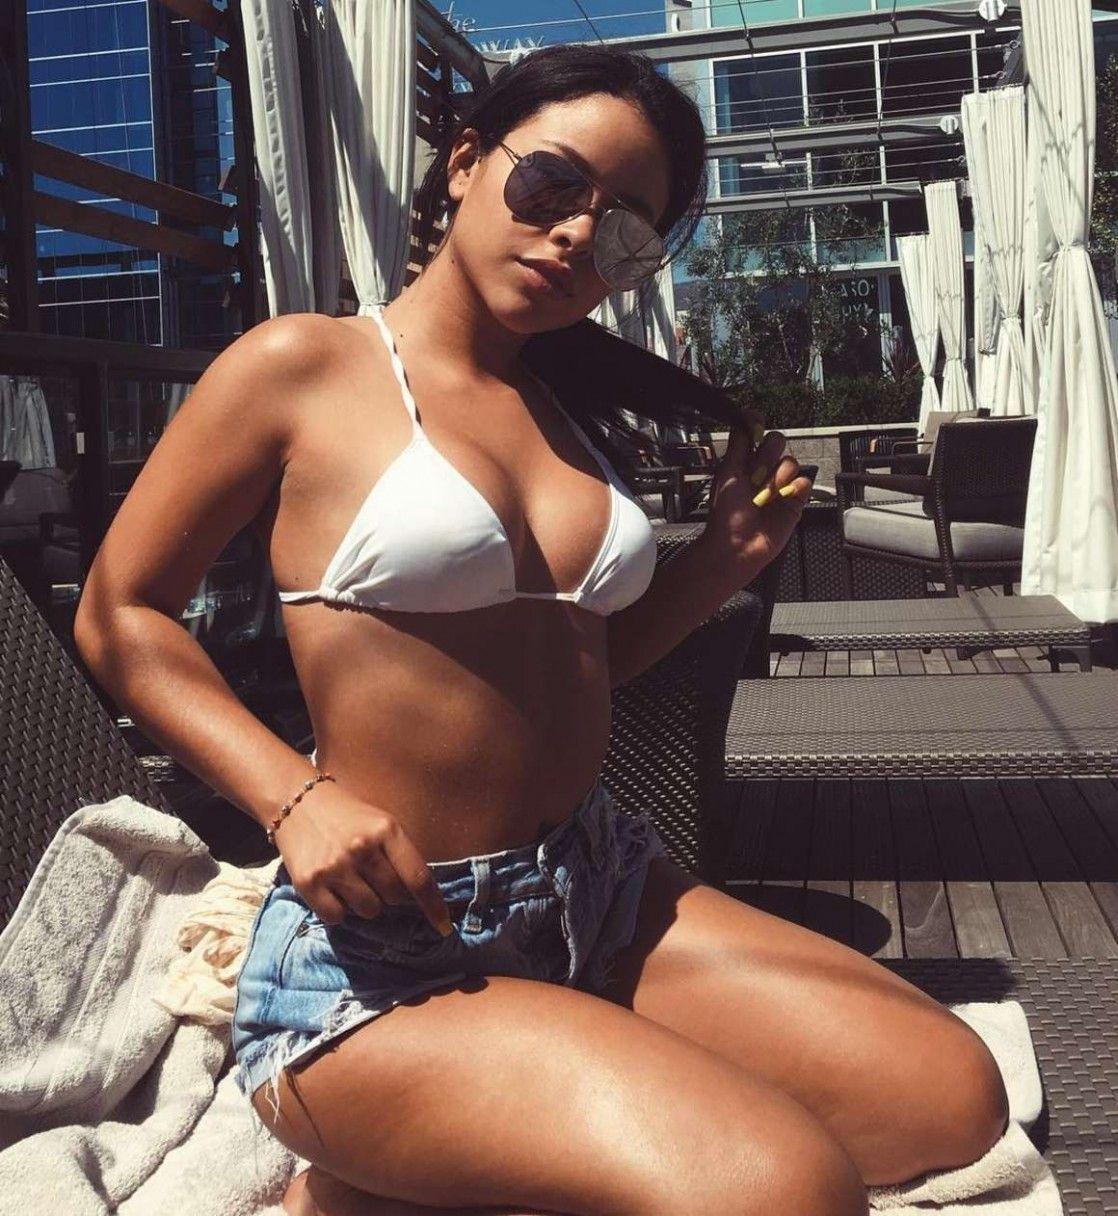 Bikini Cierra Ramirez naked (38 photo), Pussy, Hot, Feet, panties 2019